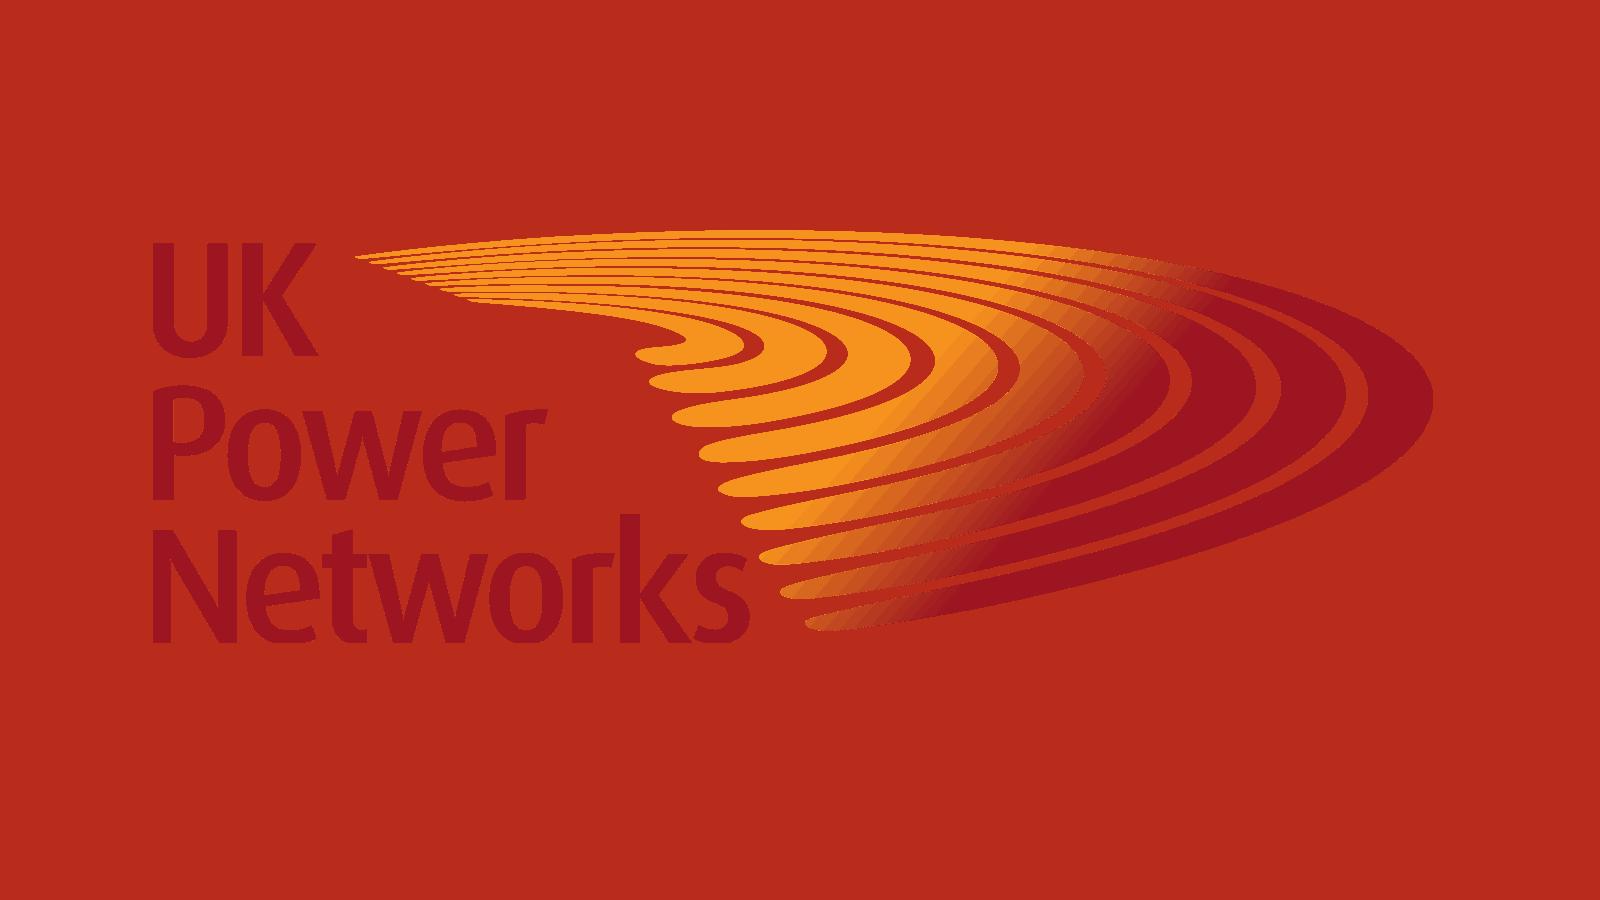 UK Power Networks Logo colour